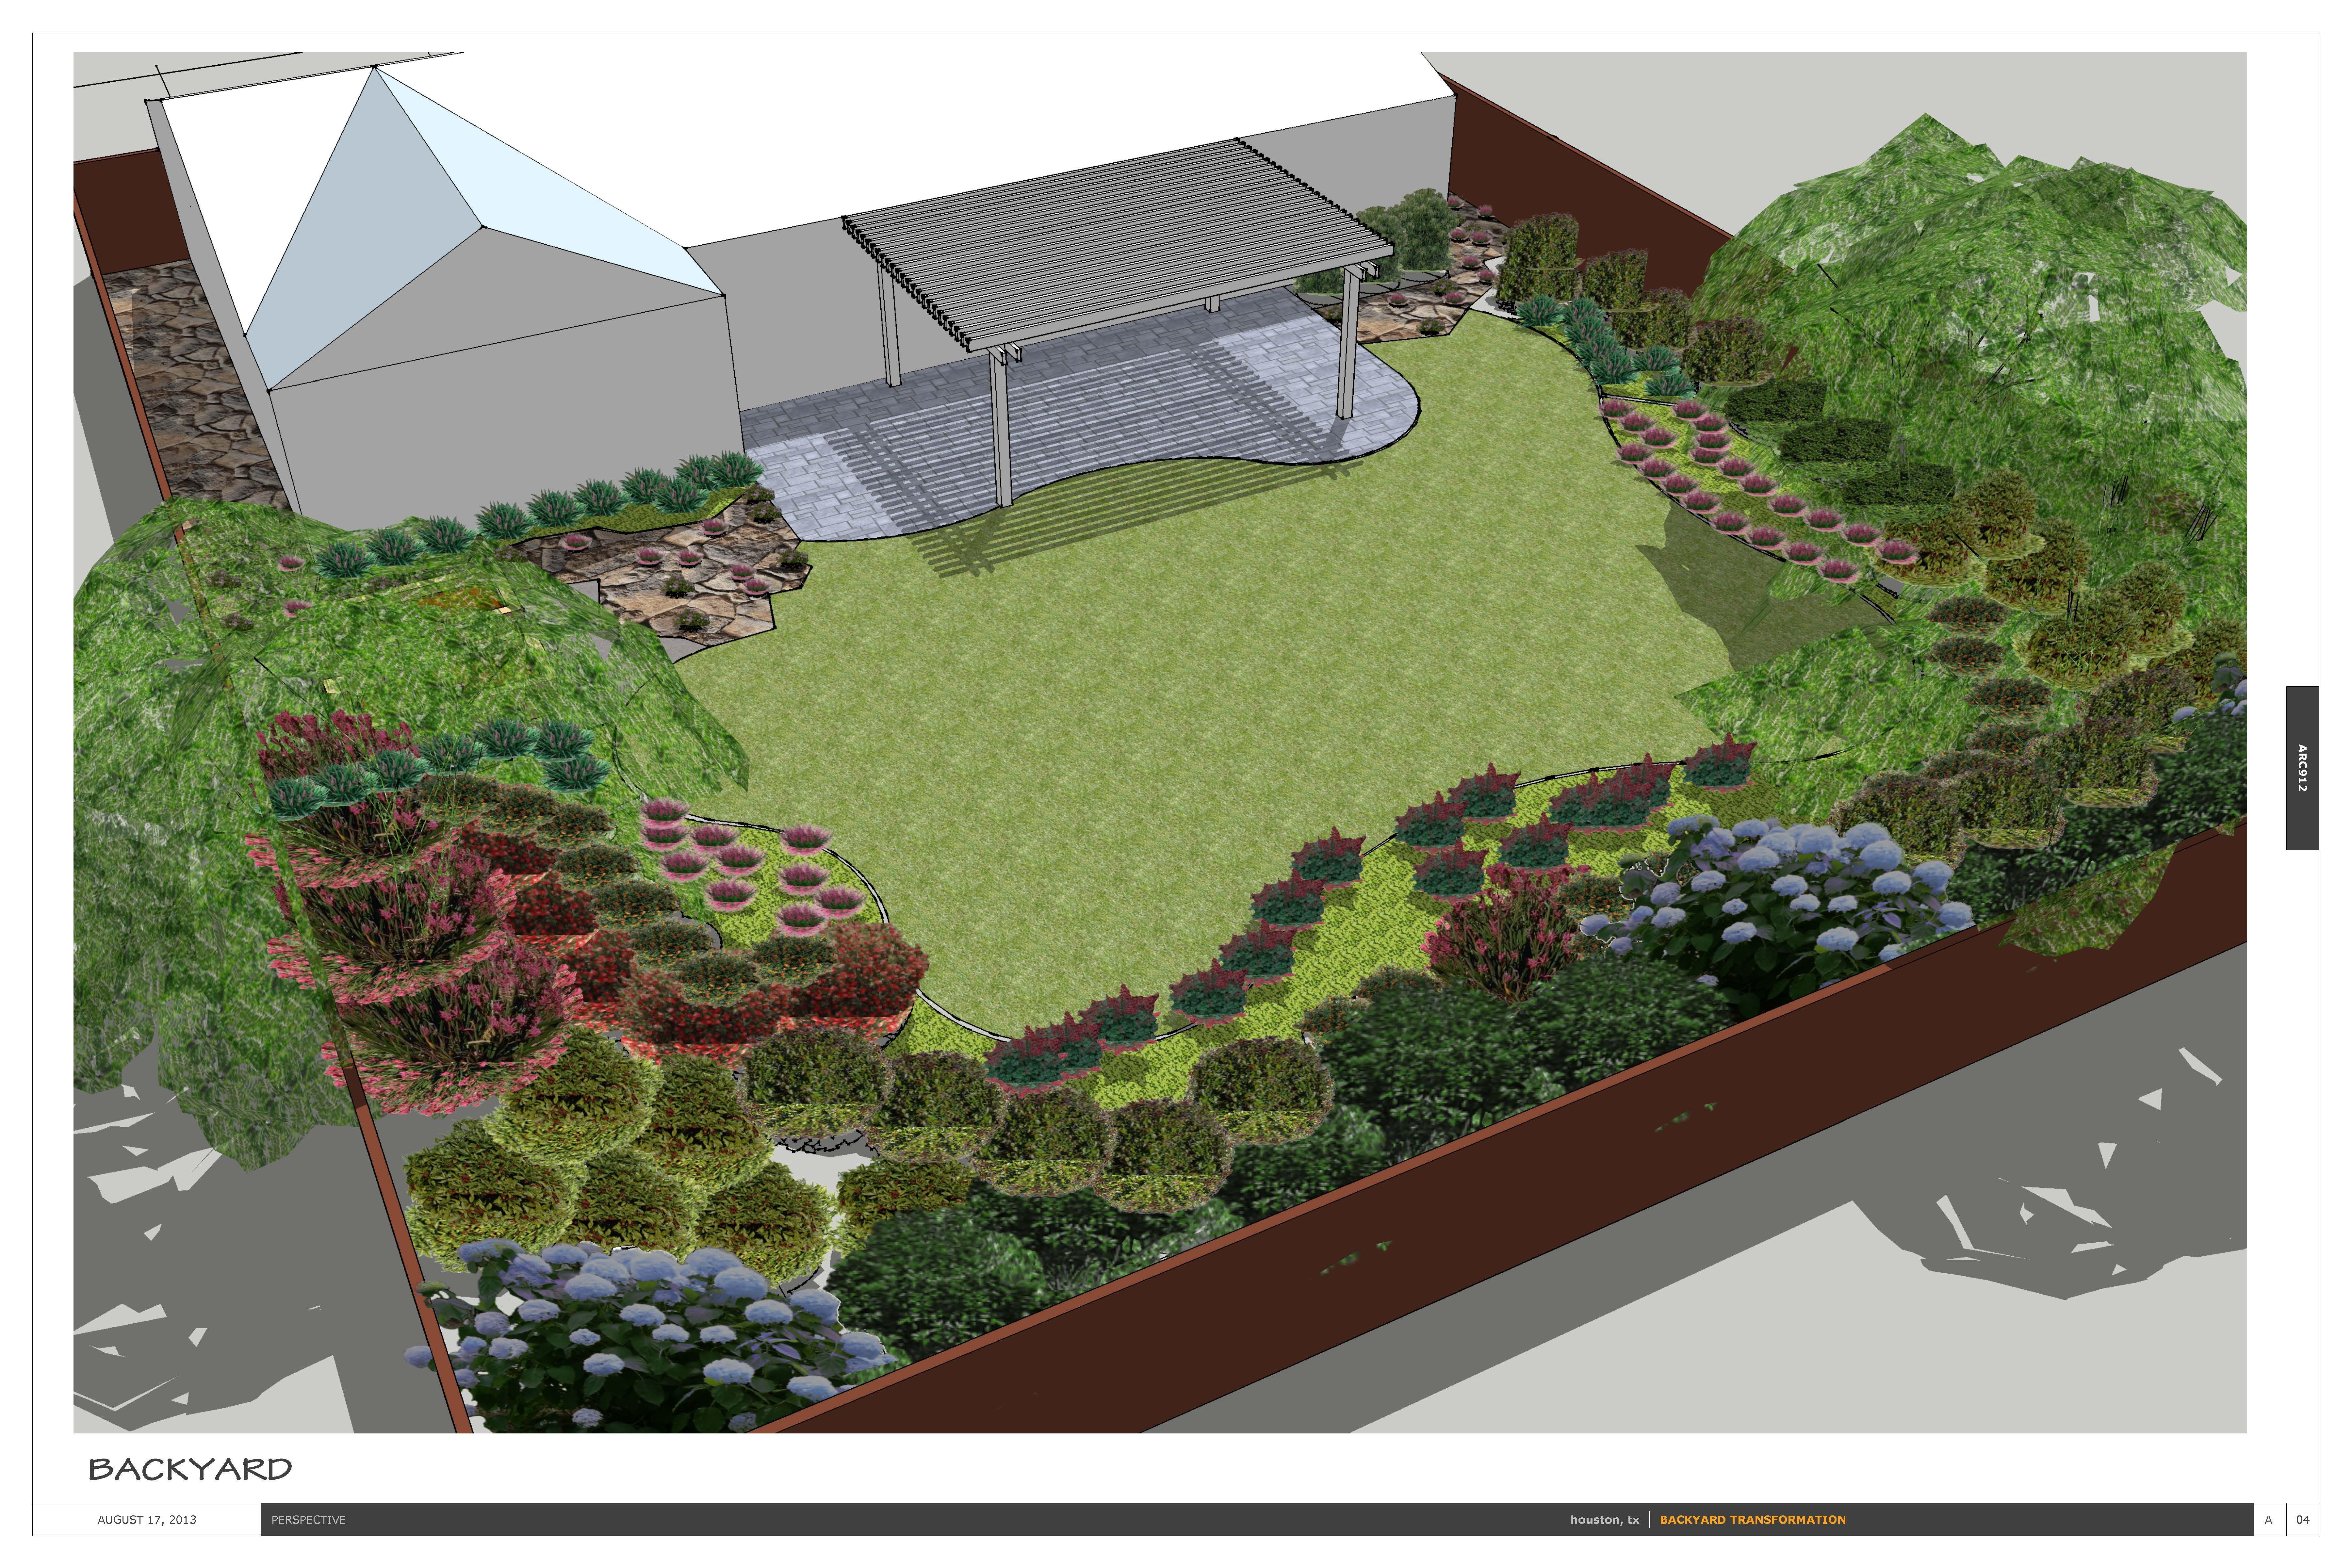 Landscape Design Macomb Community College | Bathroom Design 2017 2018 |  Pinterest | Landscape Designs, Bathroom Designs And Jacksonville Fl